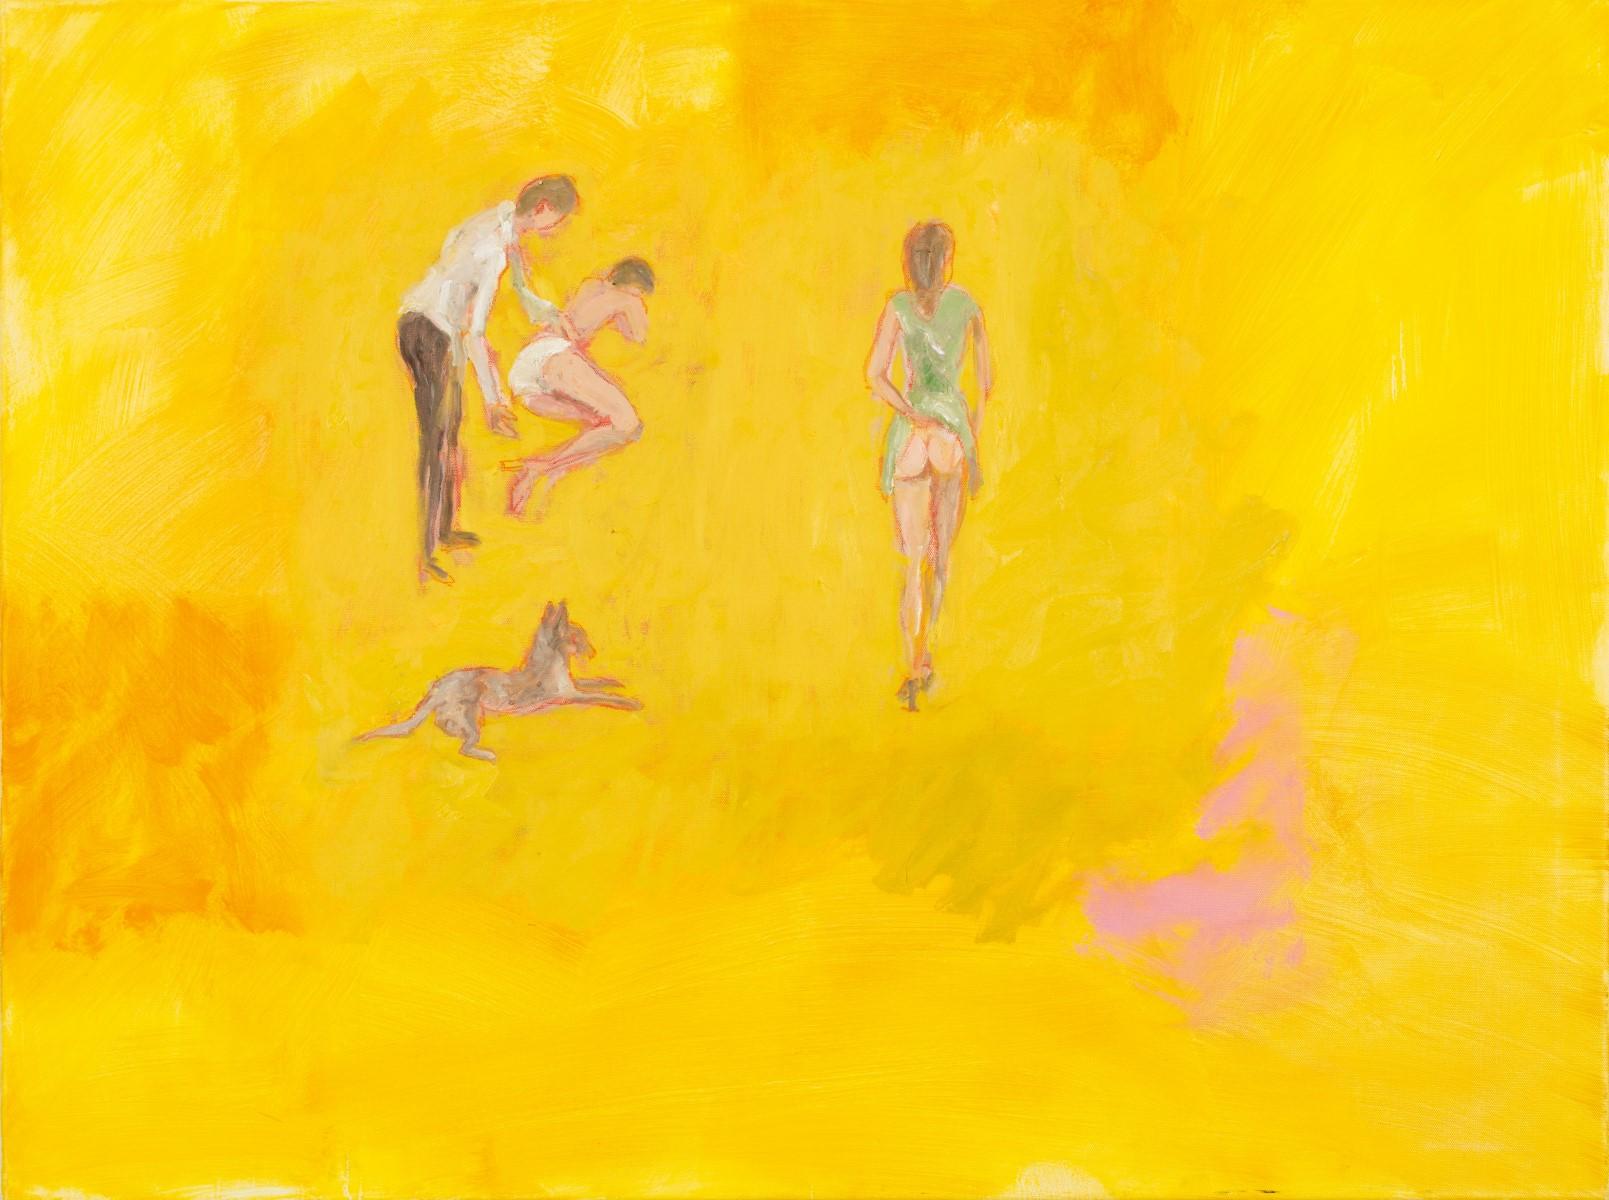 Bp Laval_Scans The Amateur Behind_oil on canvas_40_X30__2015 (Custom)